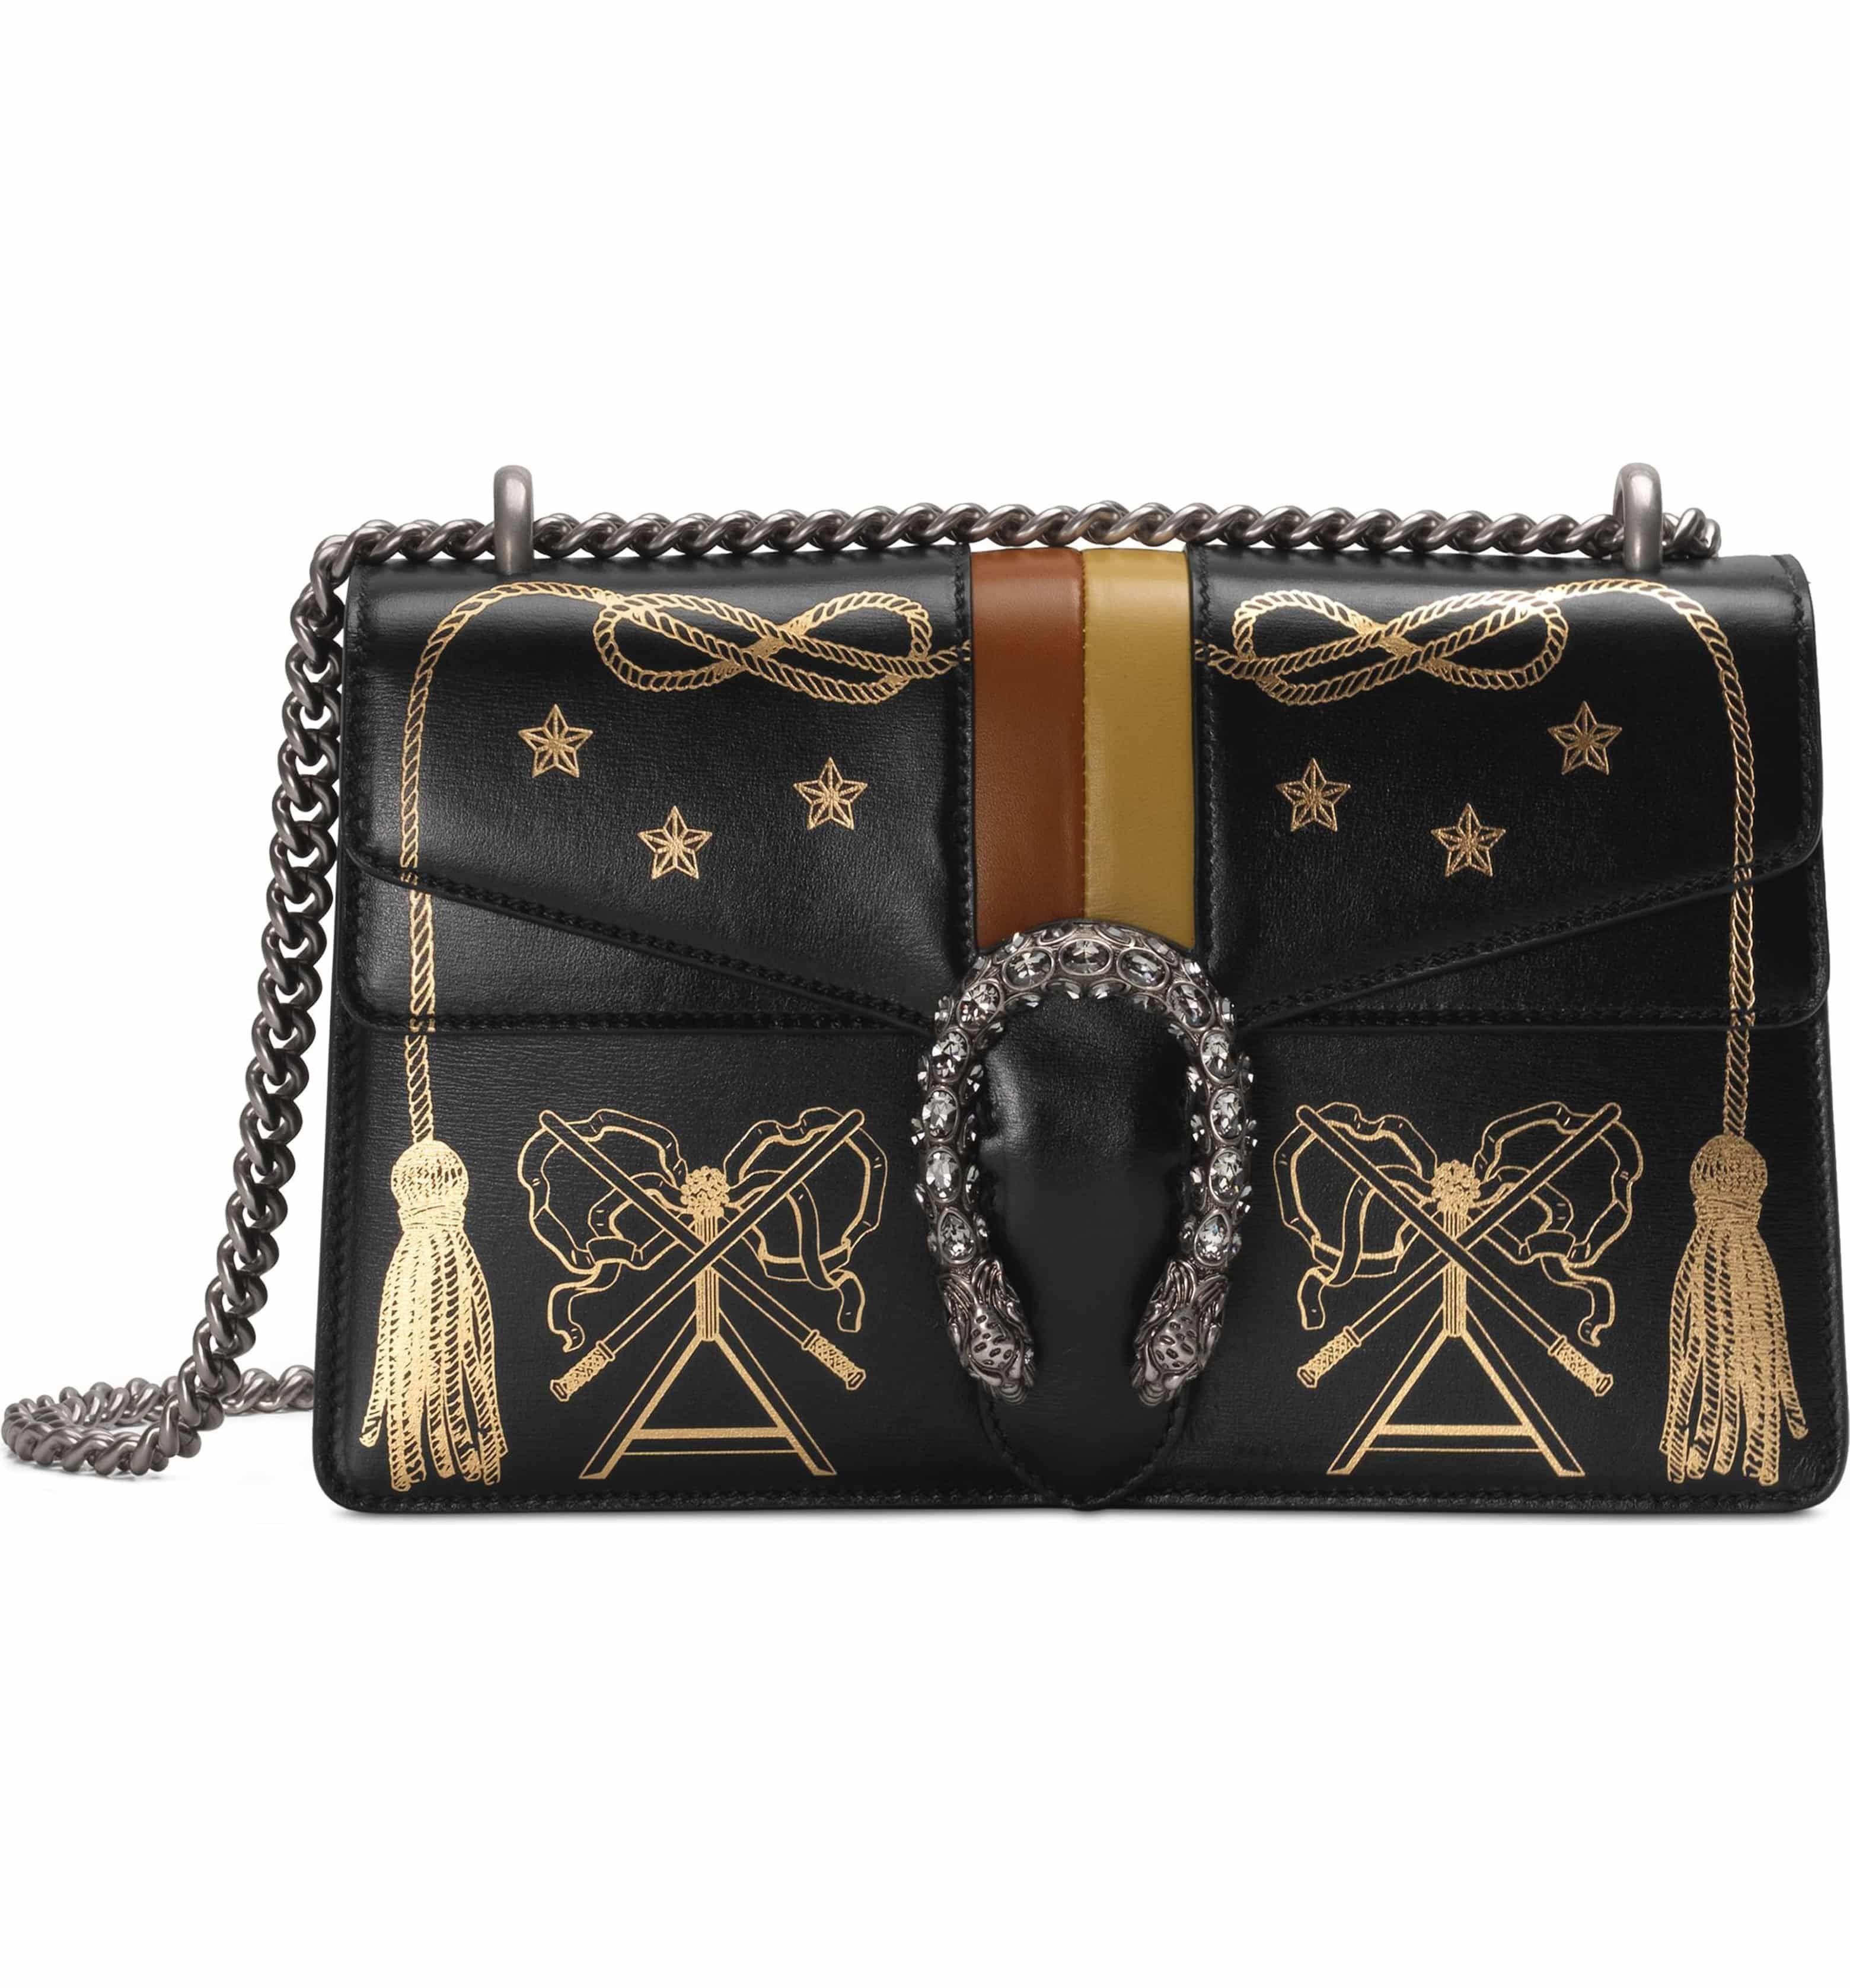 ec430189c8a Small Dionysus Leather Shoulder Bag